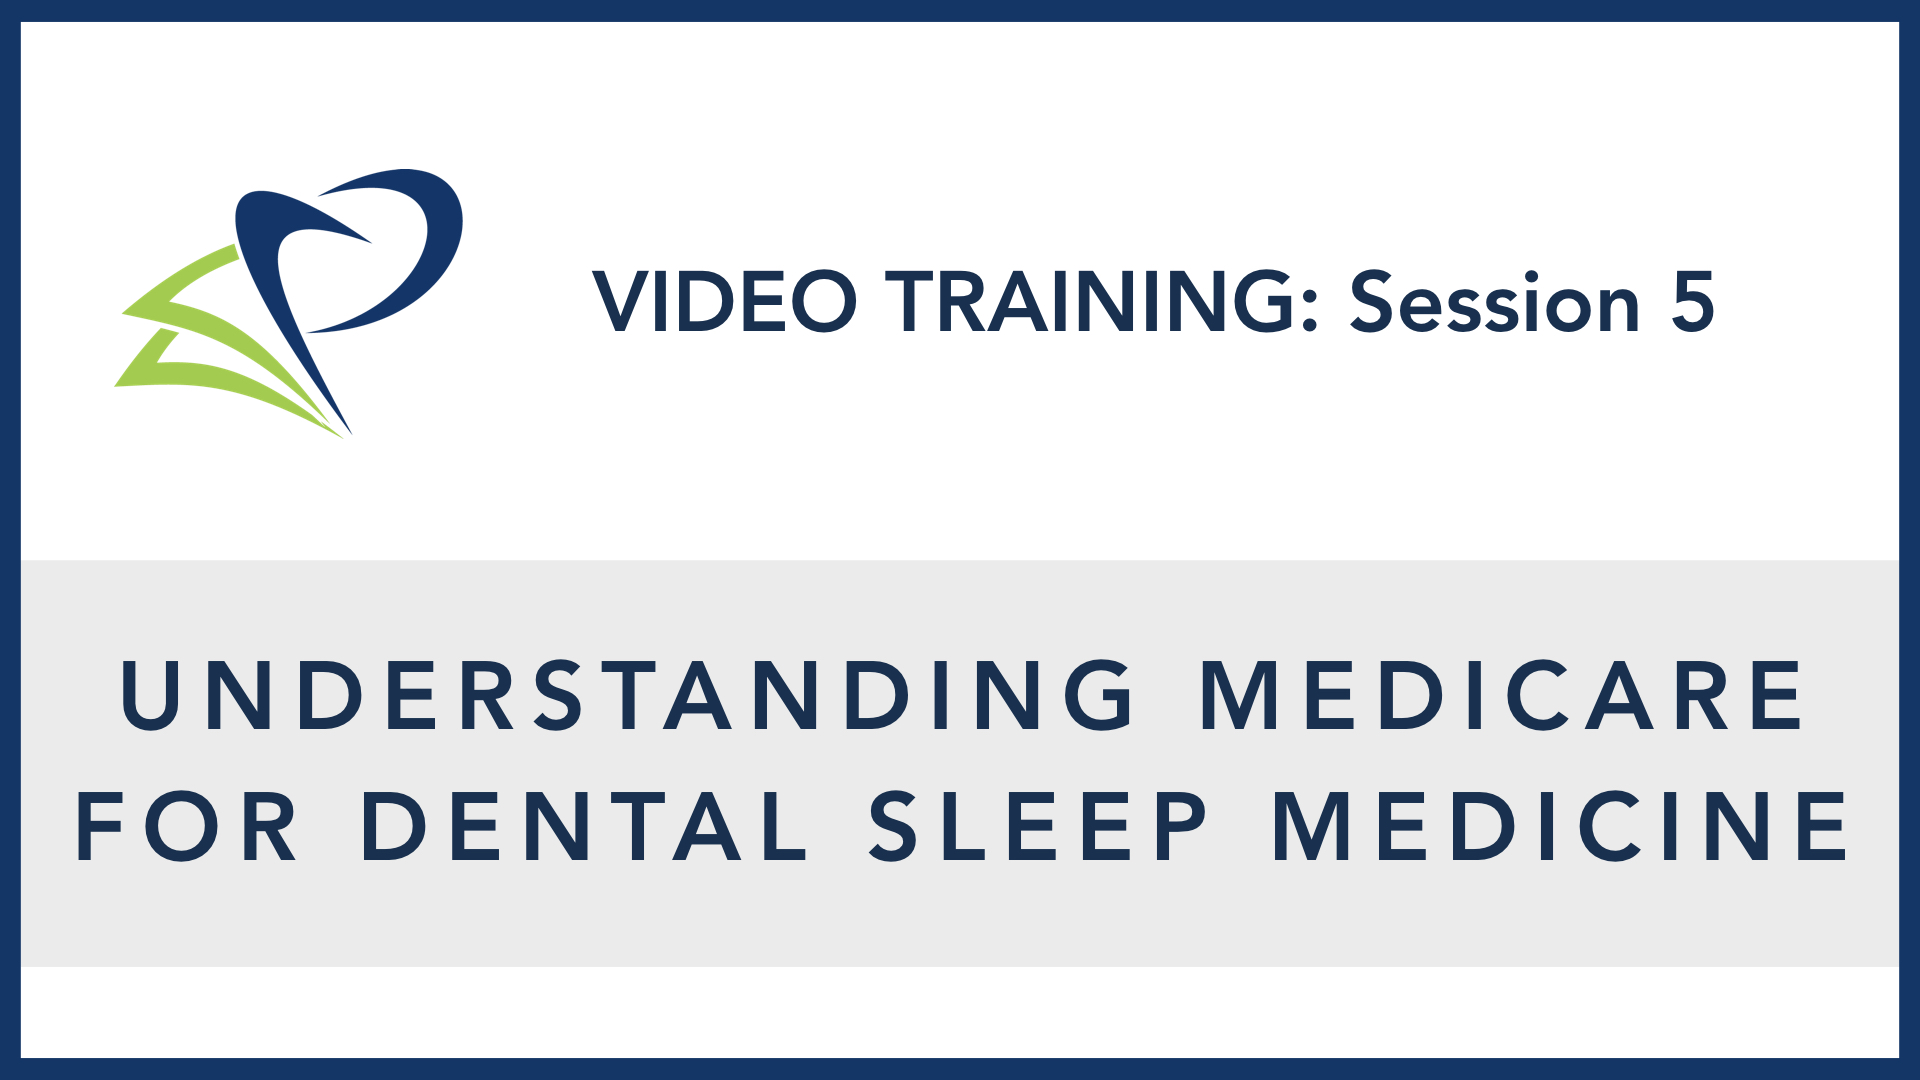 pristine slides for video trainings.005.jpeg